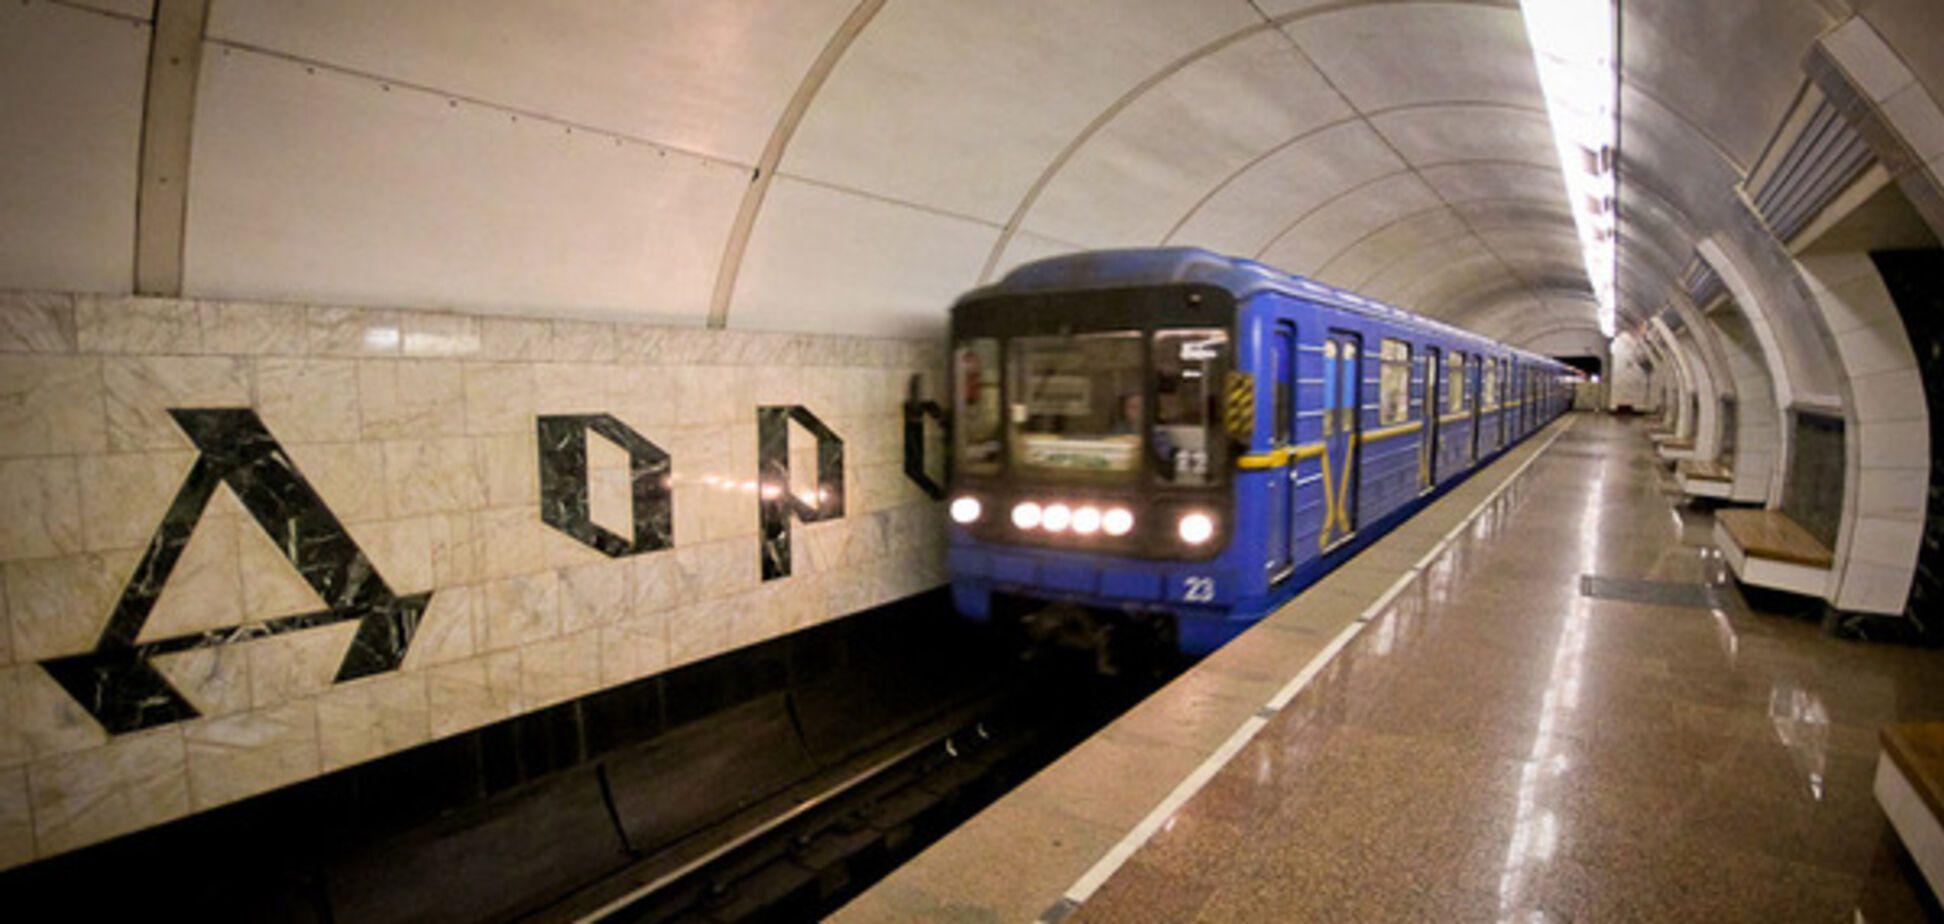 Проделки Фукса: стало известно, кто нагрел руку за счет 'Киевского метрополитена'